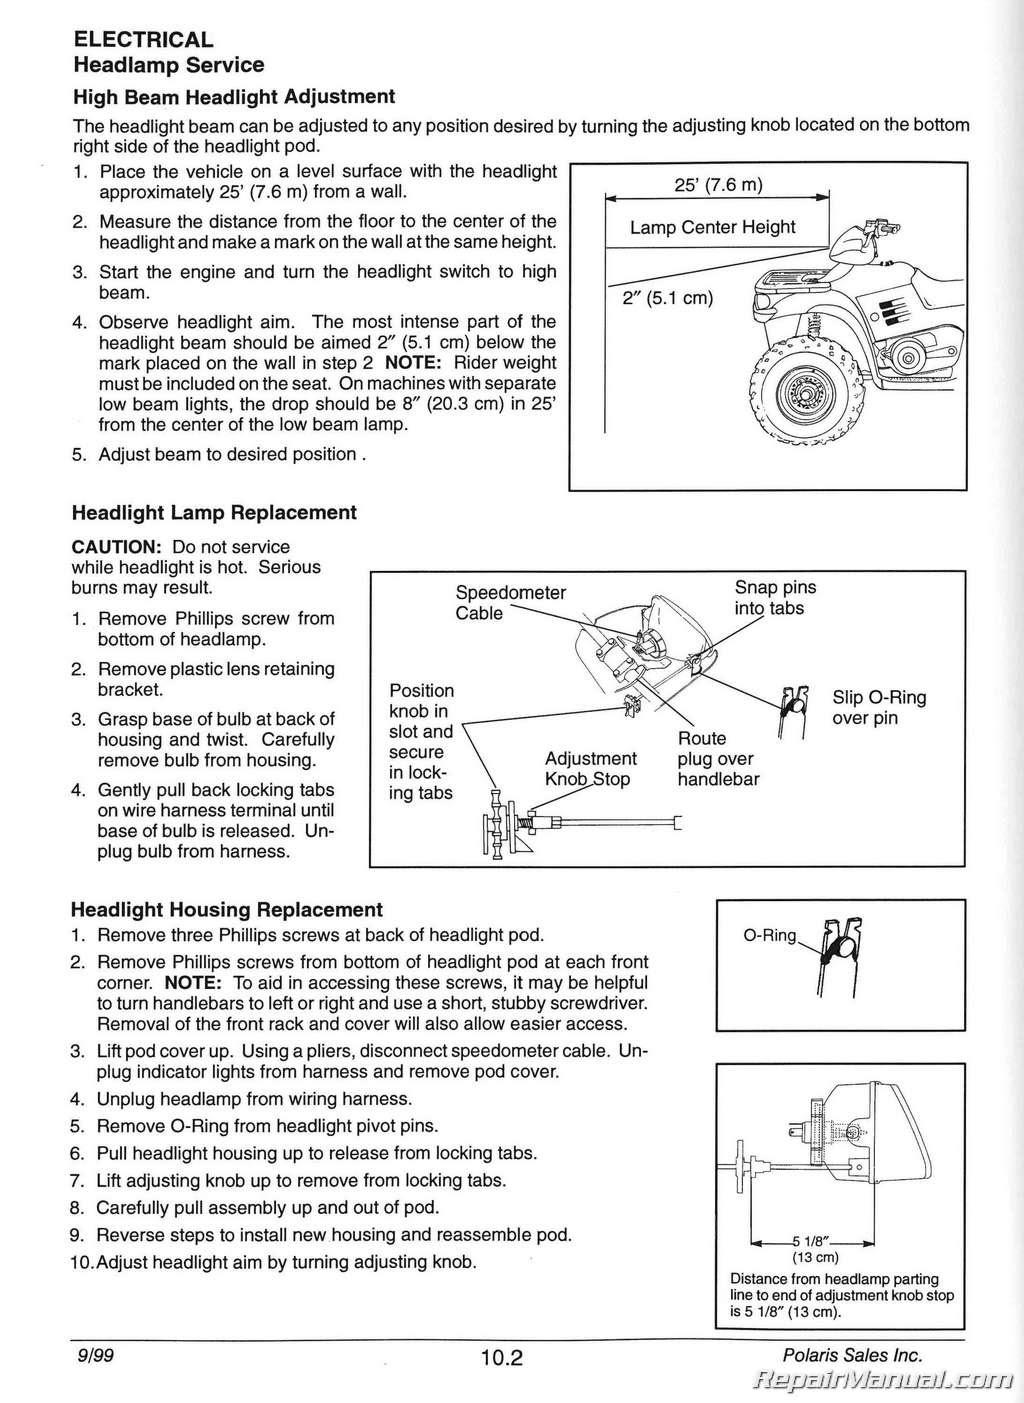 Diagram Polaris Sportsman 335 Wiring Diagram Full Version Hd Quality Wiring Diagram Cadieceoronacasasdecorintia Poderonevecchio It